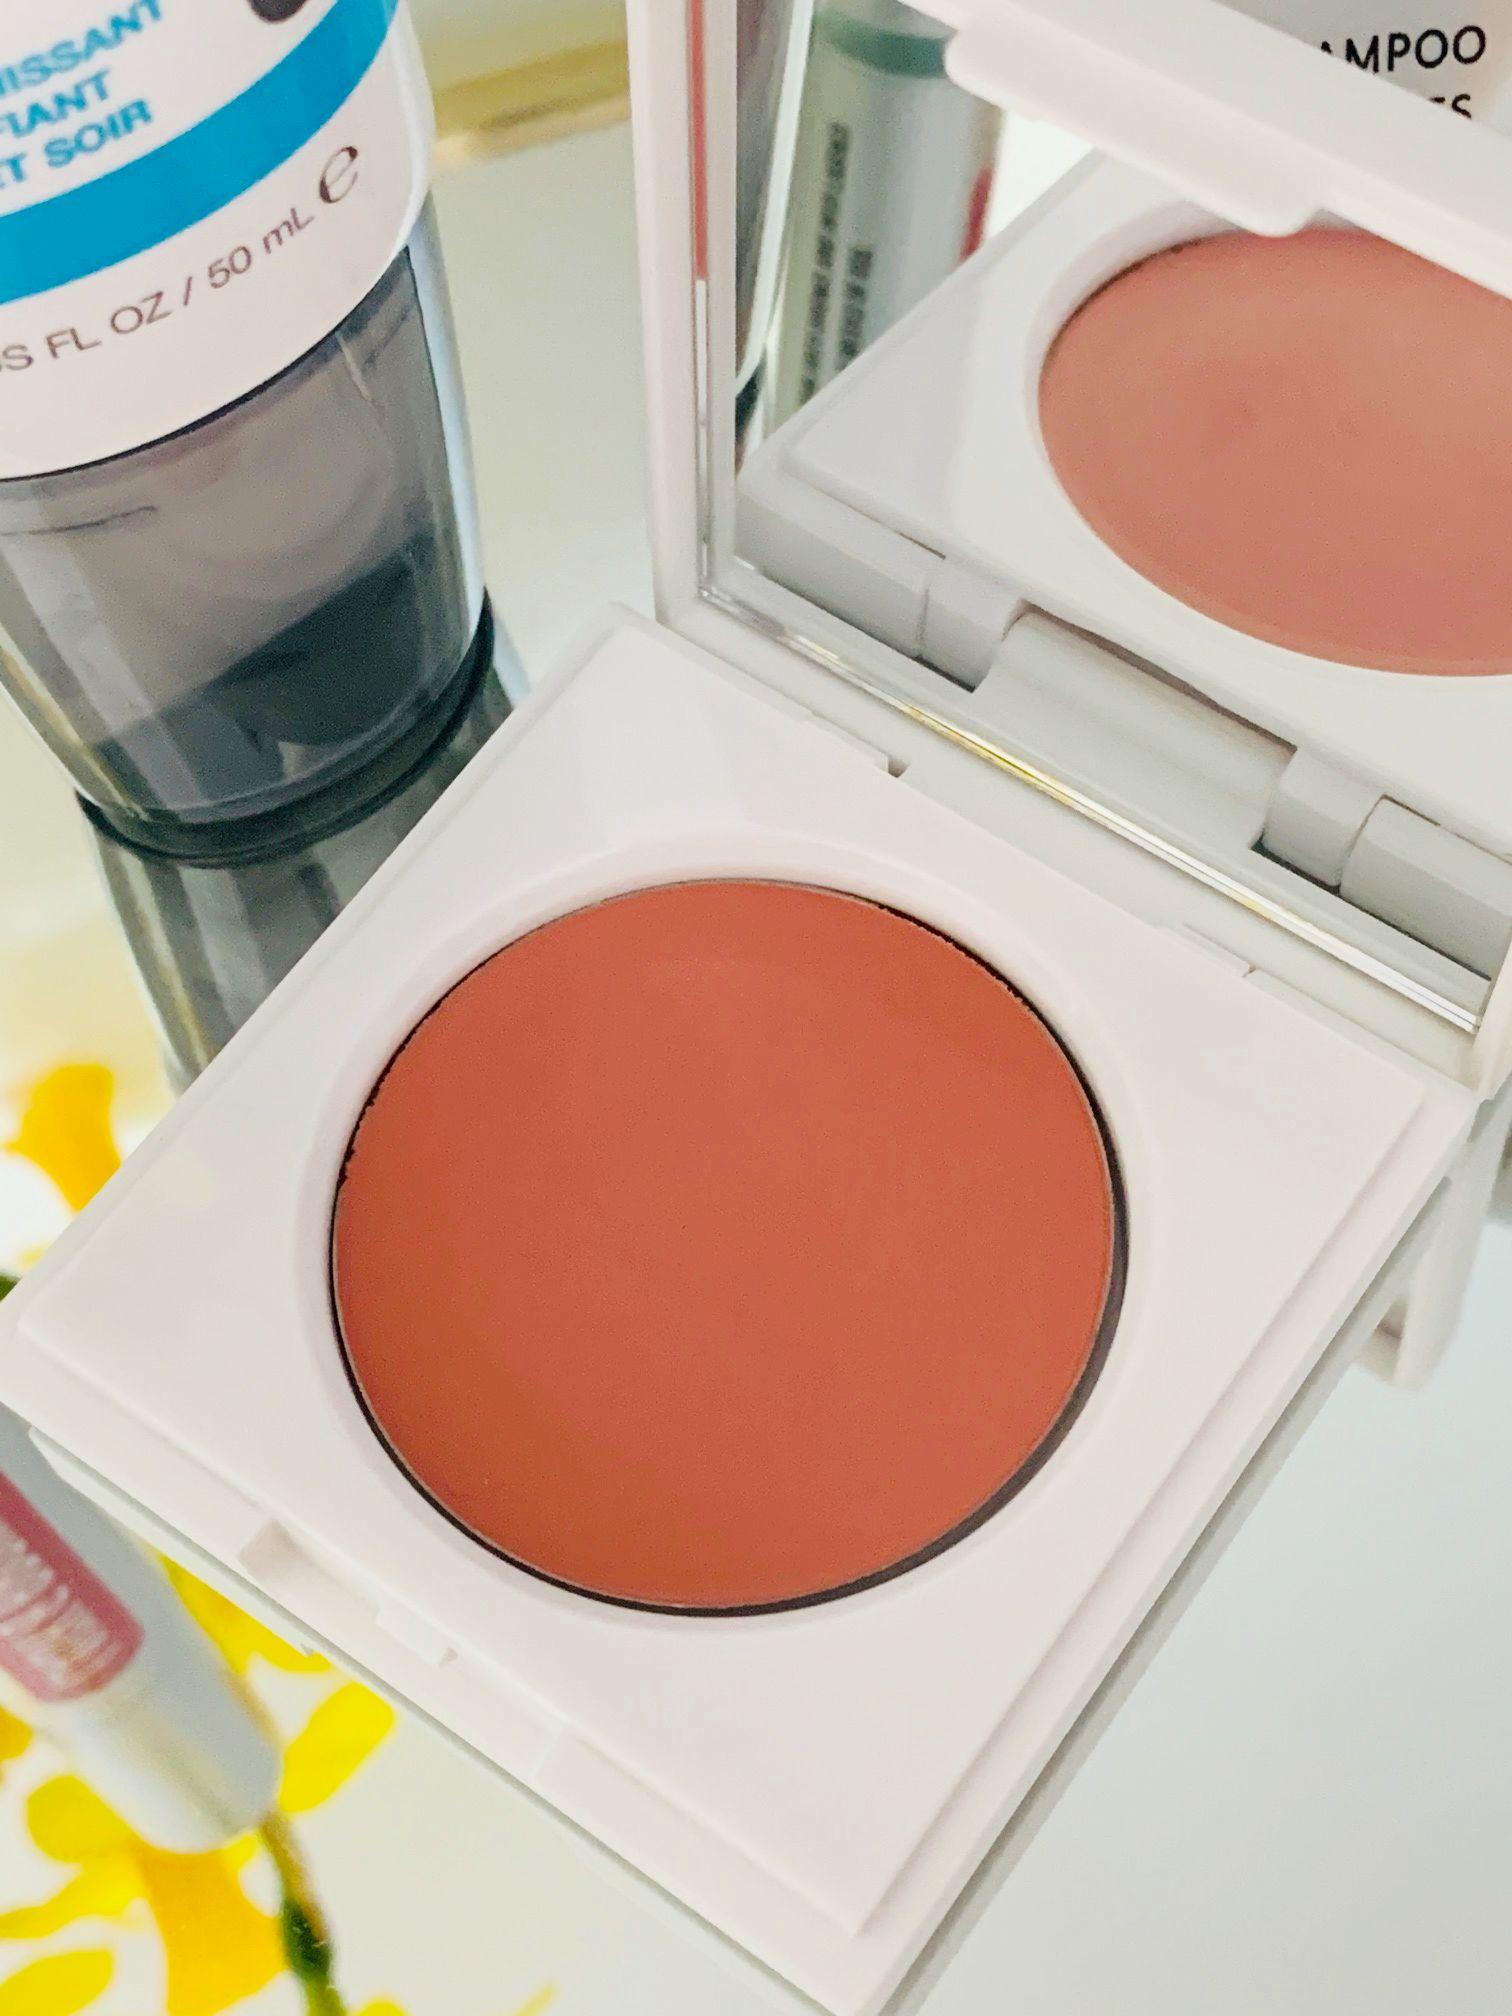 Honest Beauty Cream Cheek Blush